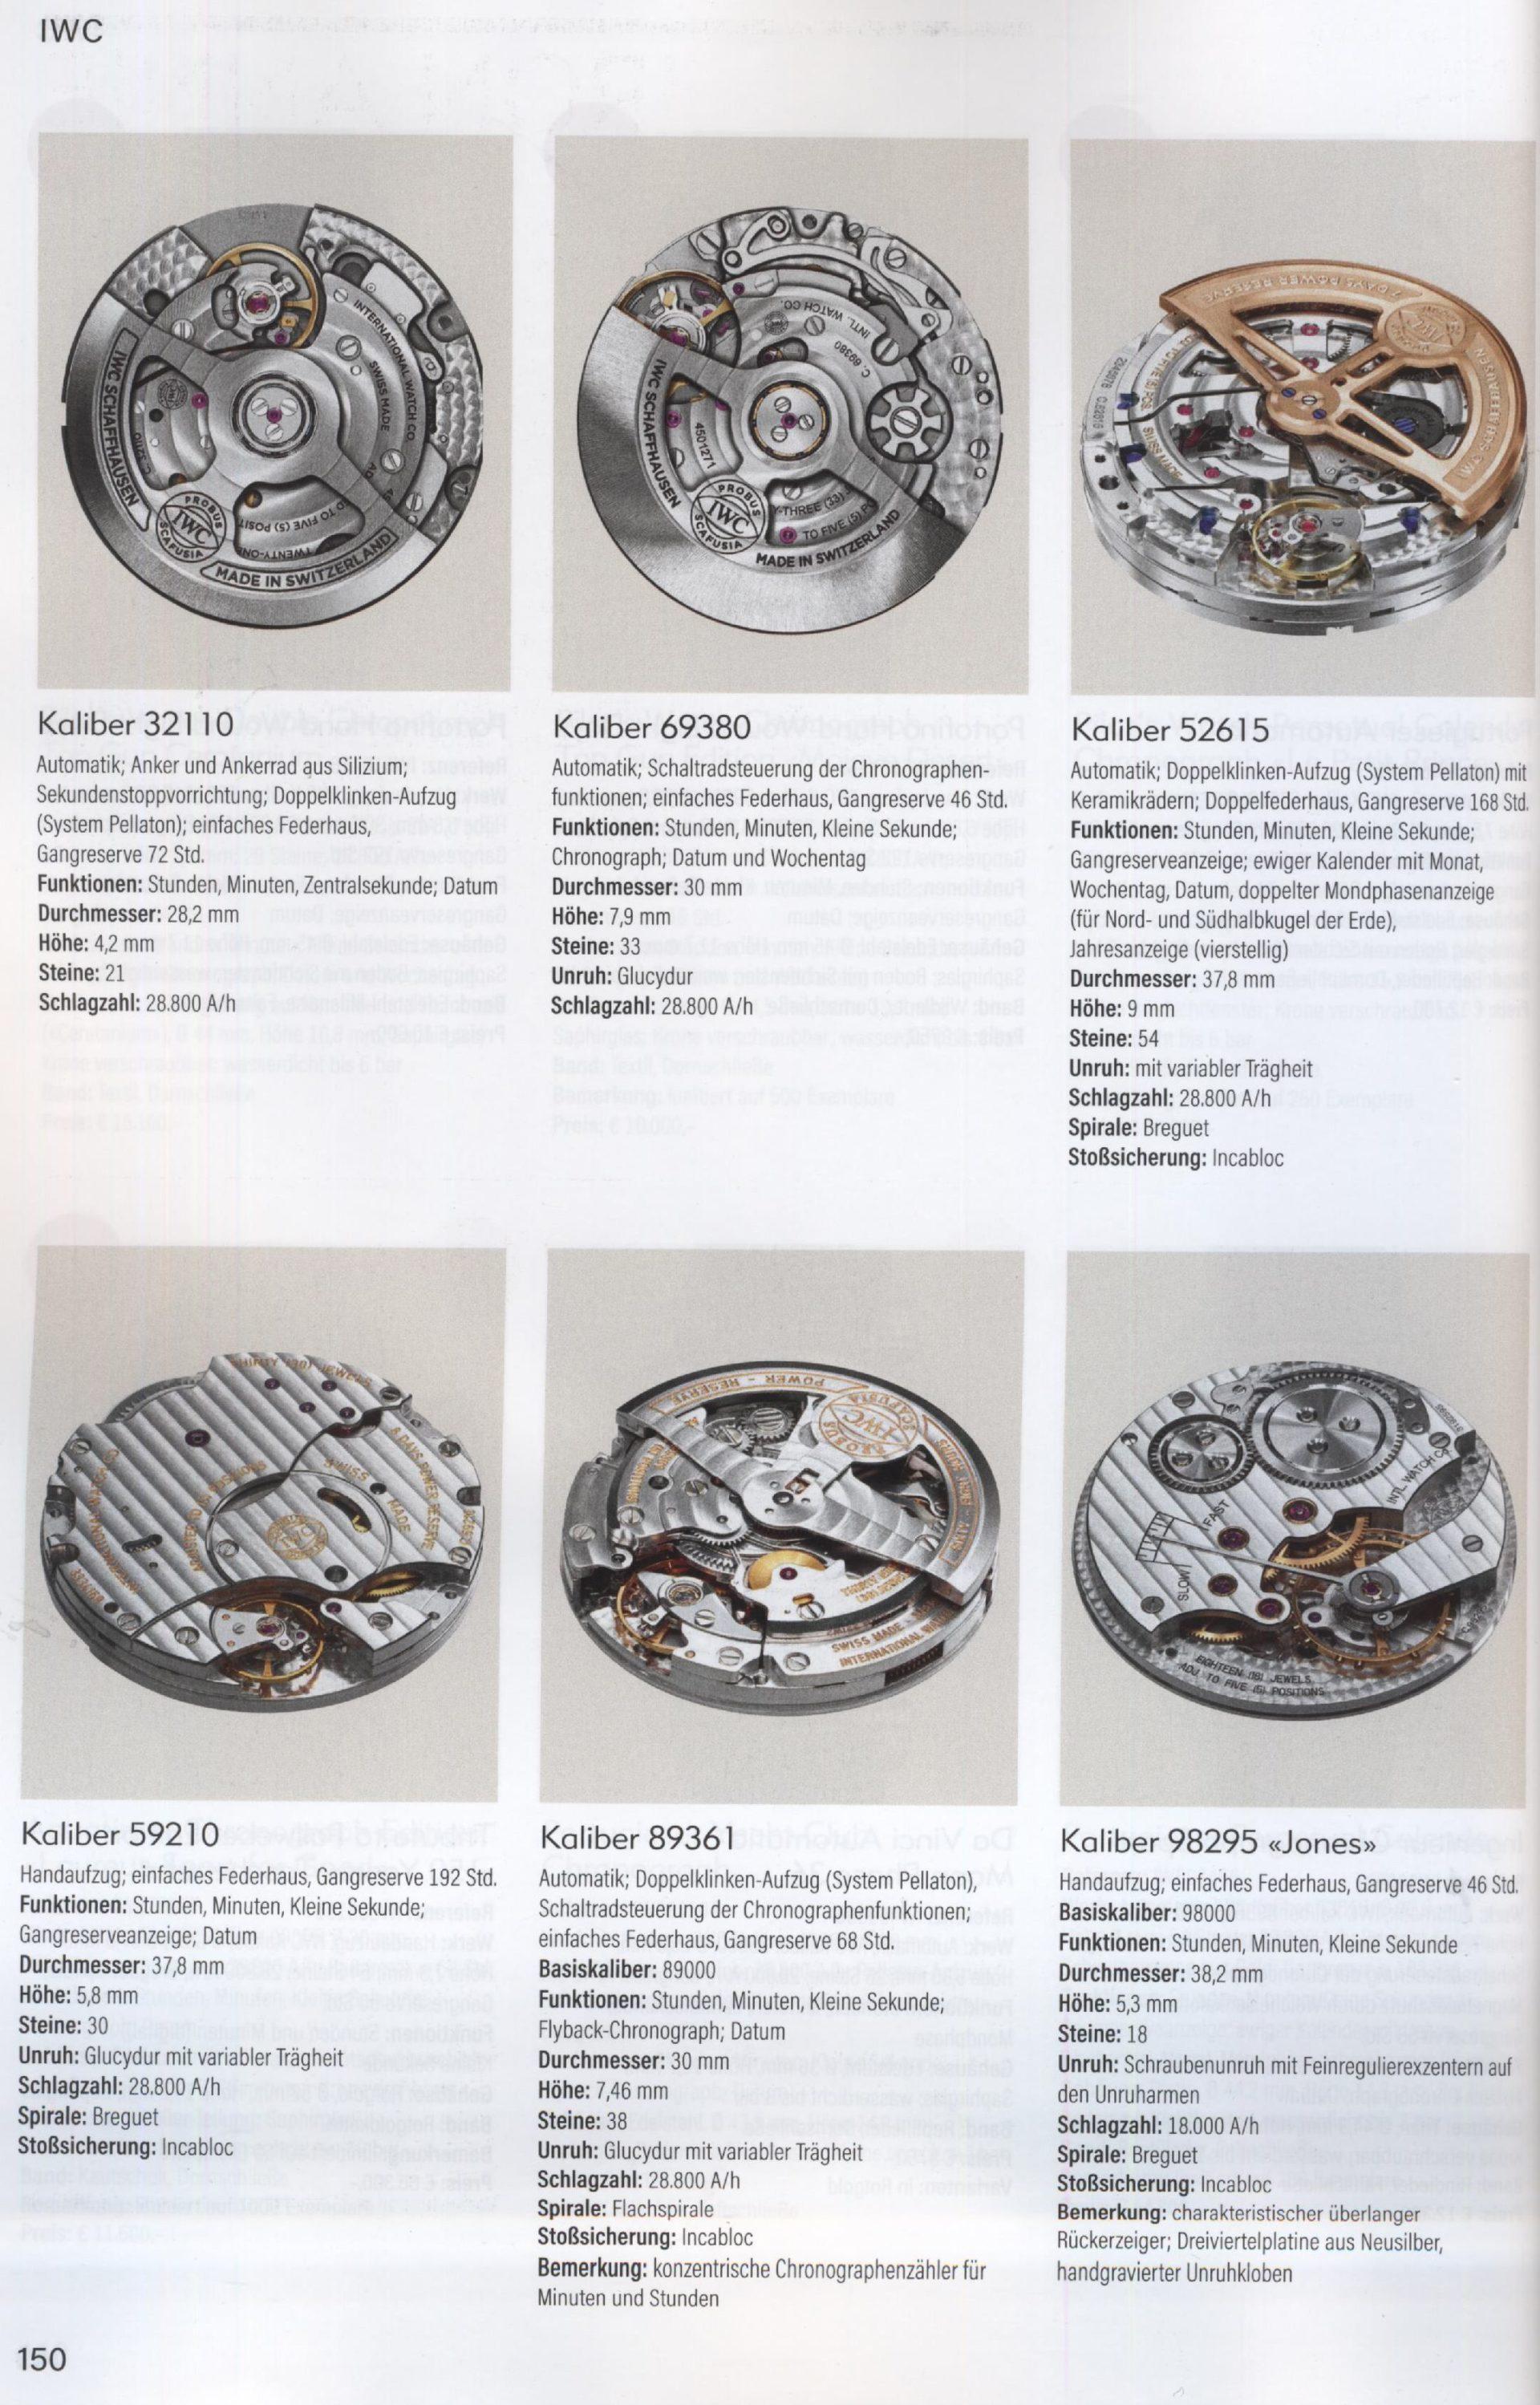 Armbanduhren Katalog Heel 2019 IWC